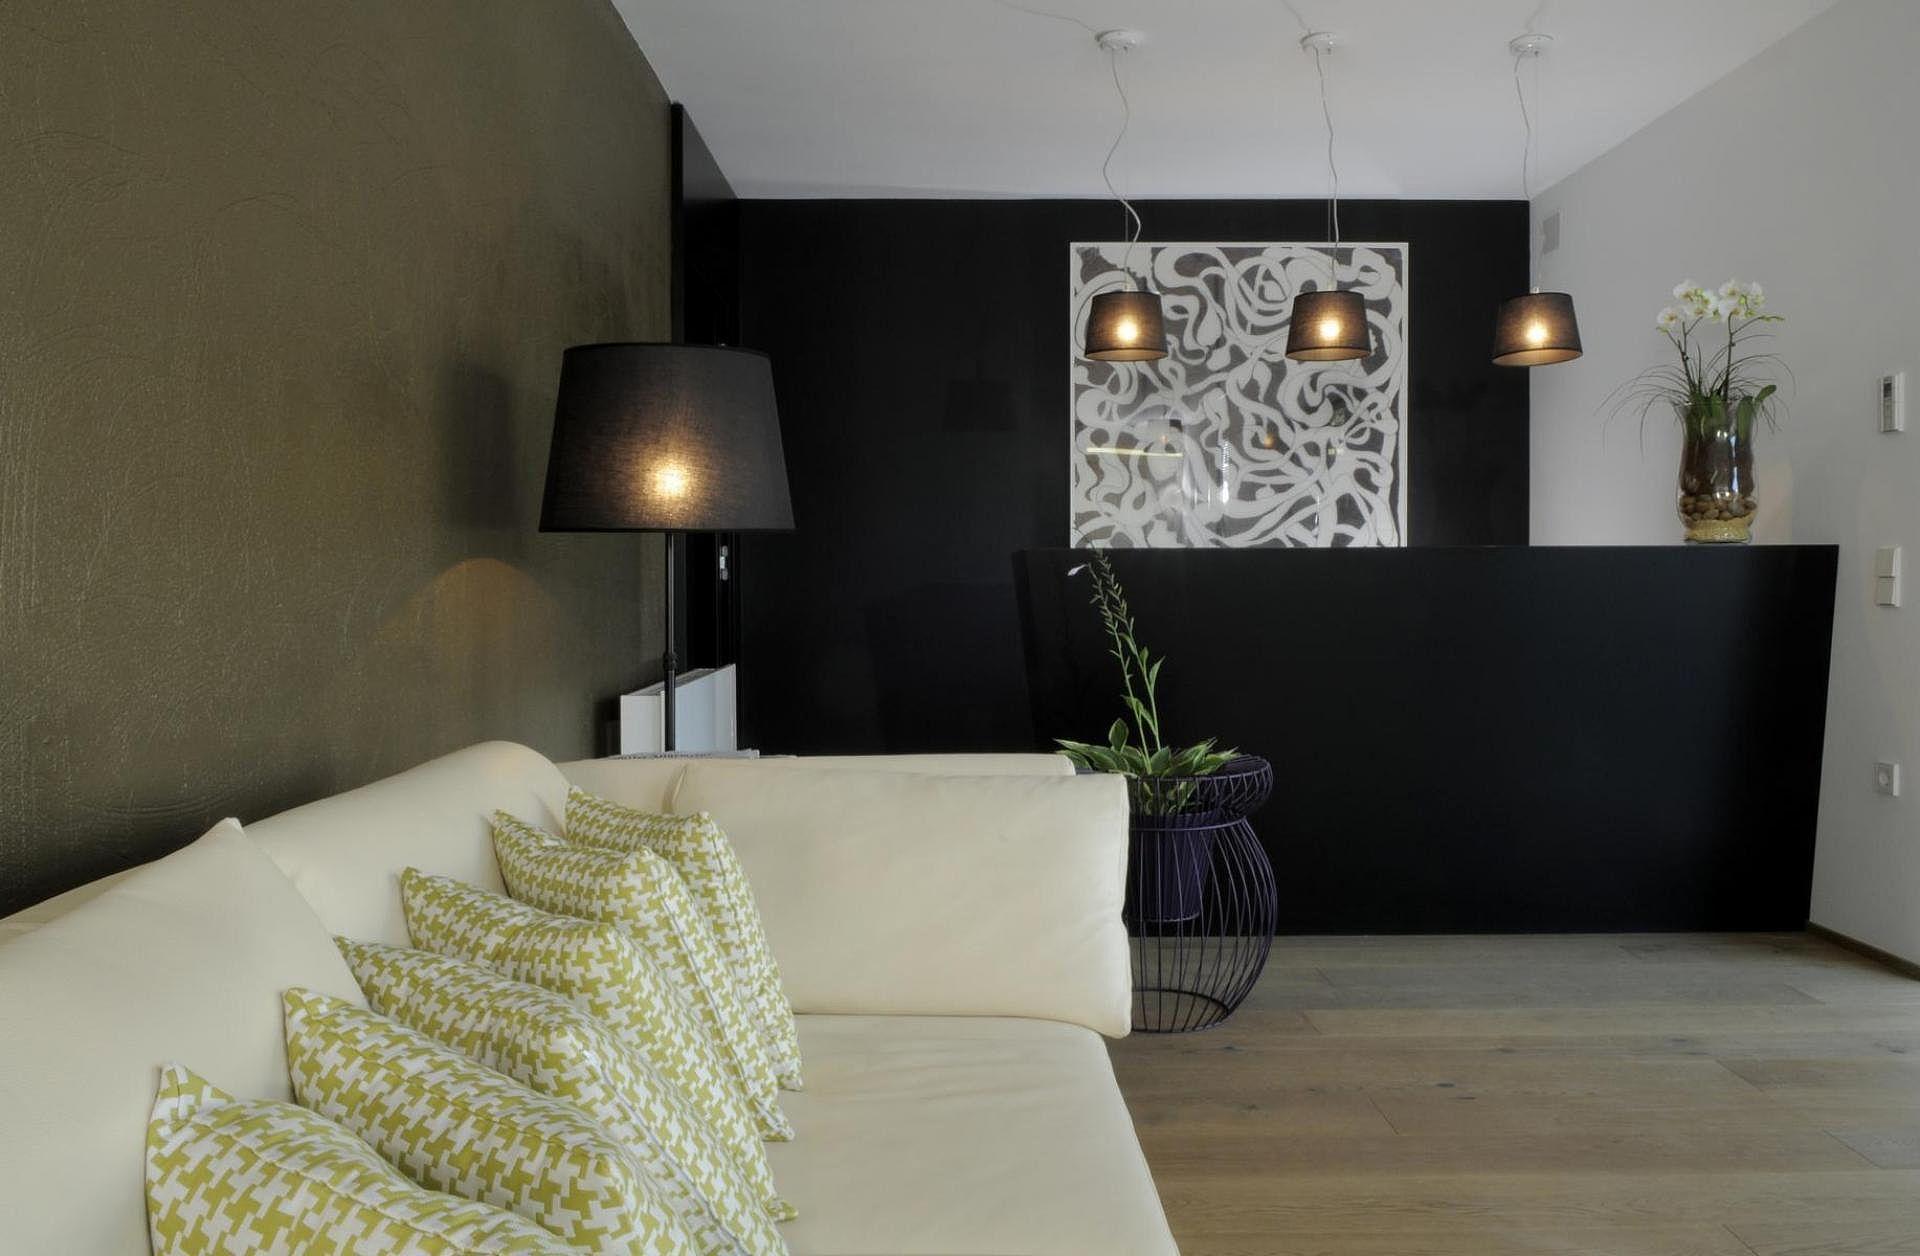 Gius la residenza s dtirol online zum bestpreis buchen for Designhotel gius la residenza